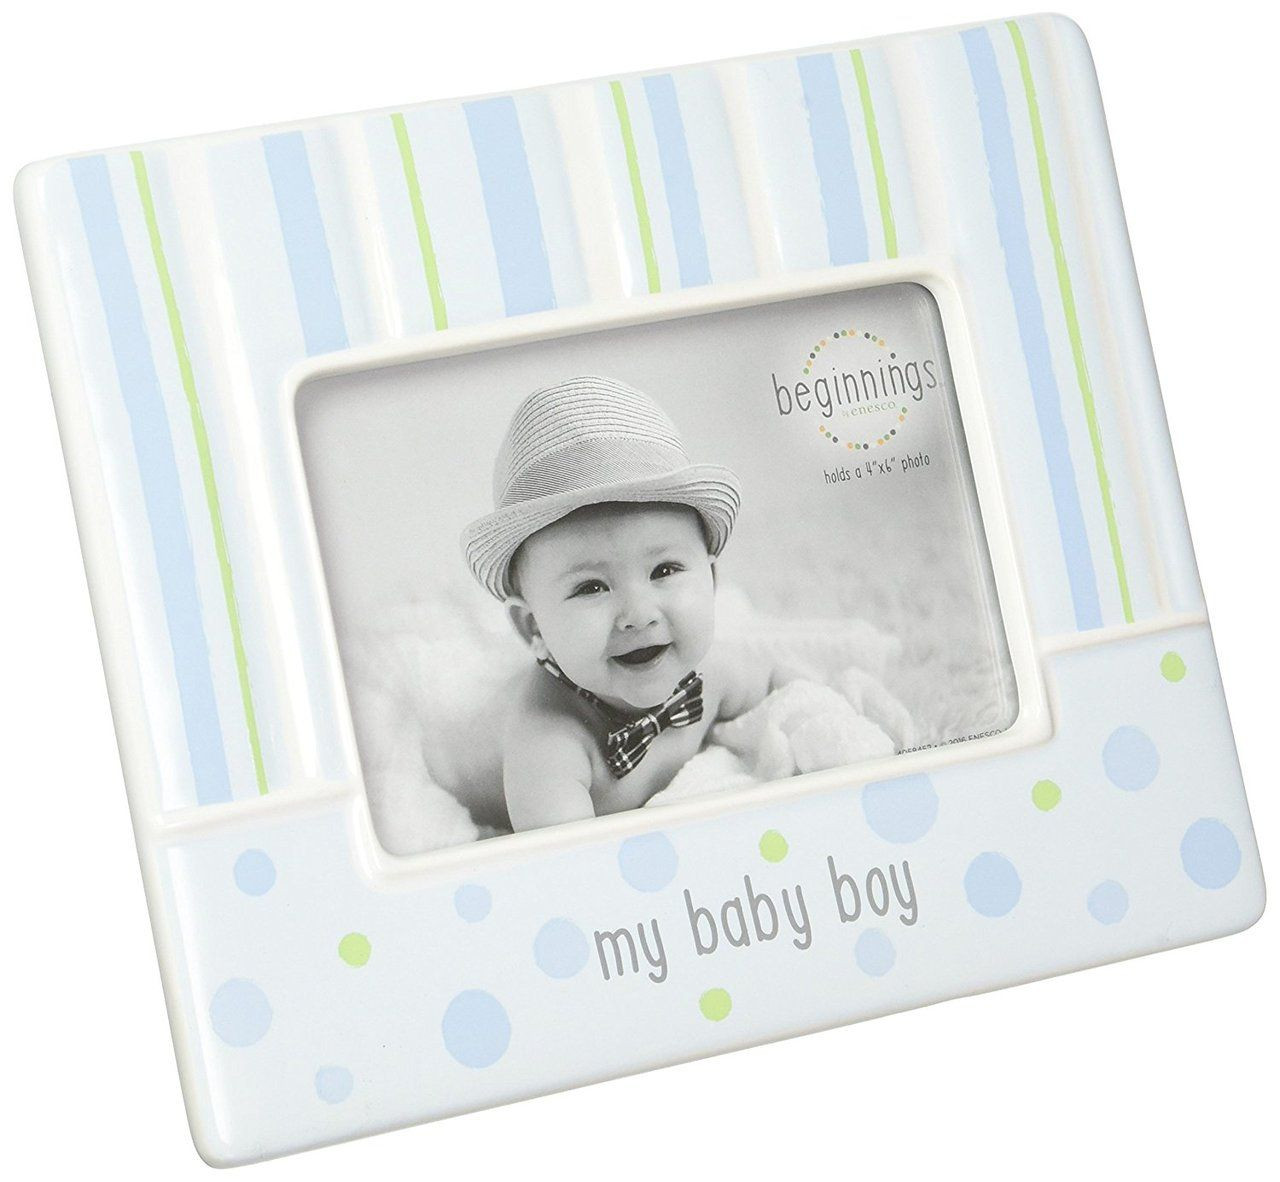 Beginnings by Enesco My Baby Boy Photo Frame, Blue - Bluebasilgifts.com